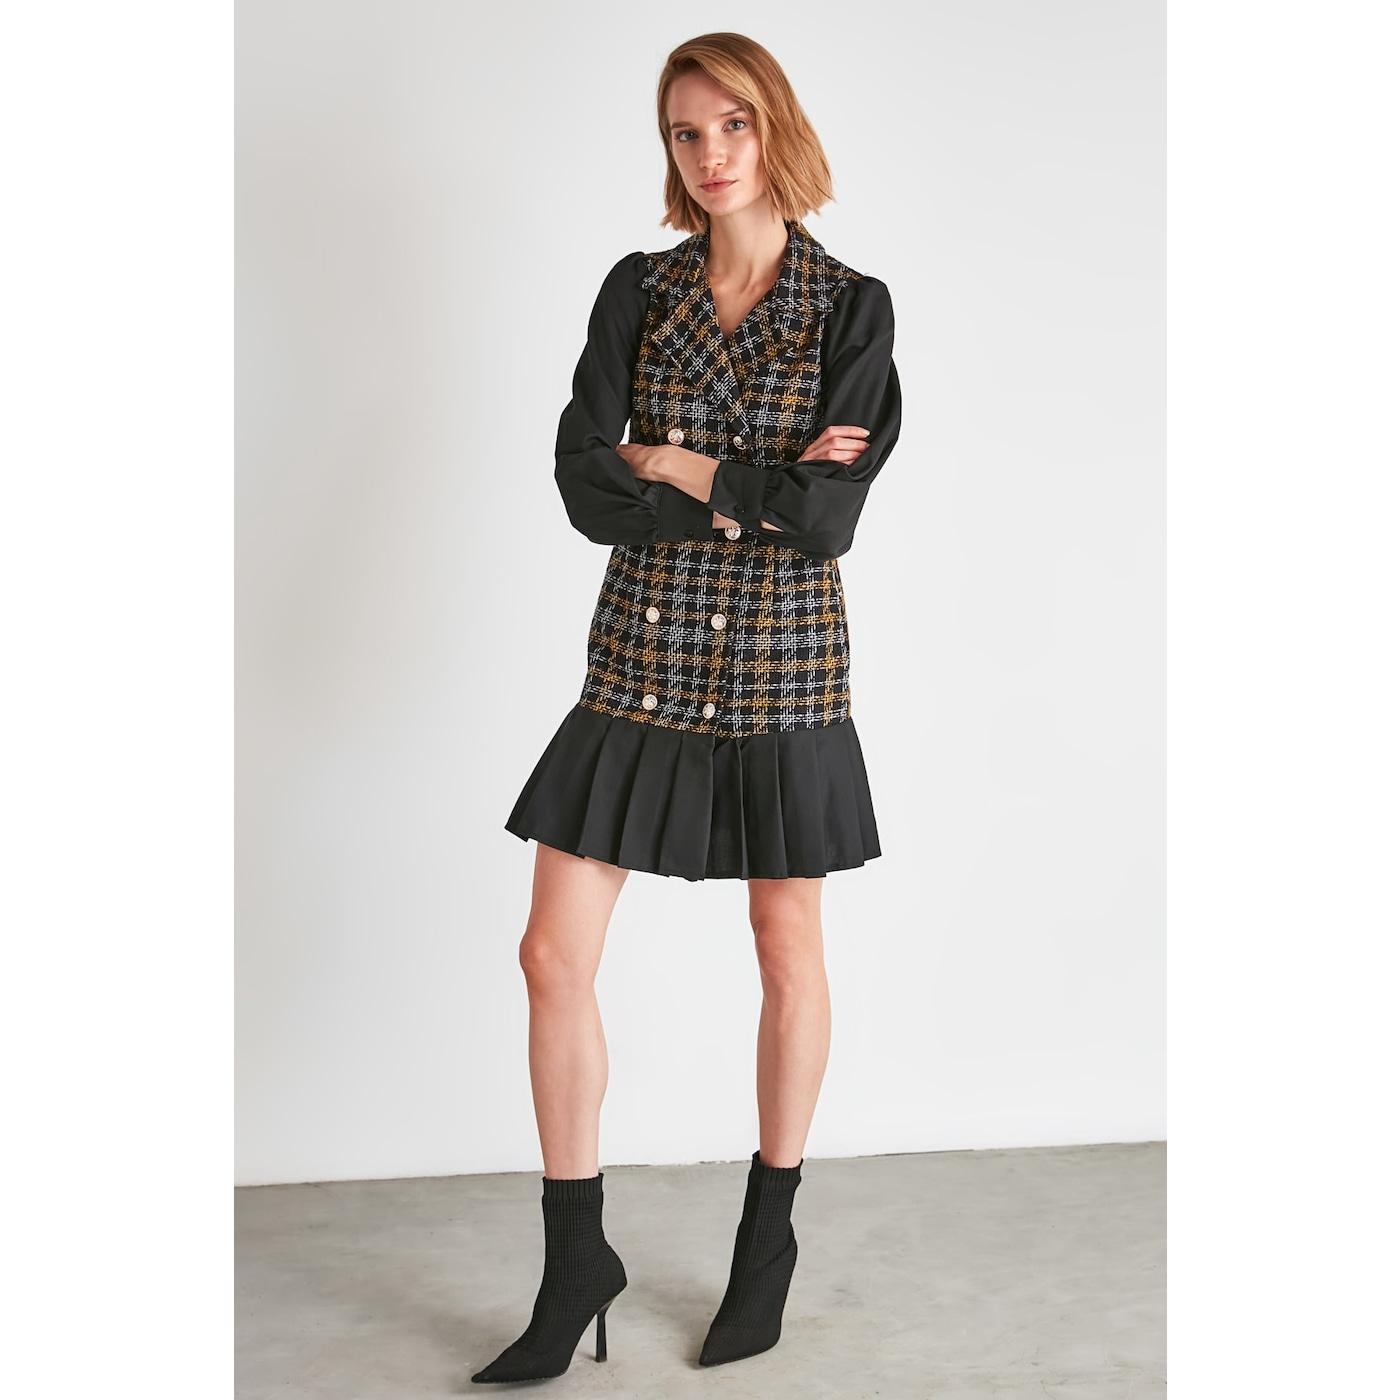 Trendyol Multicolored Tweed Jacket Dress dámské 38